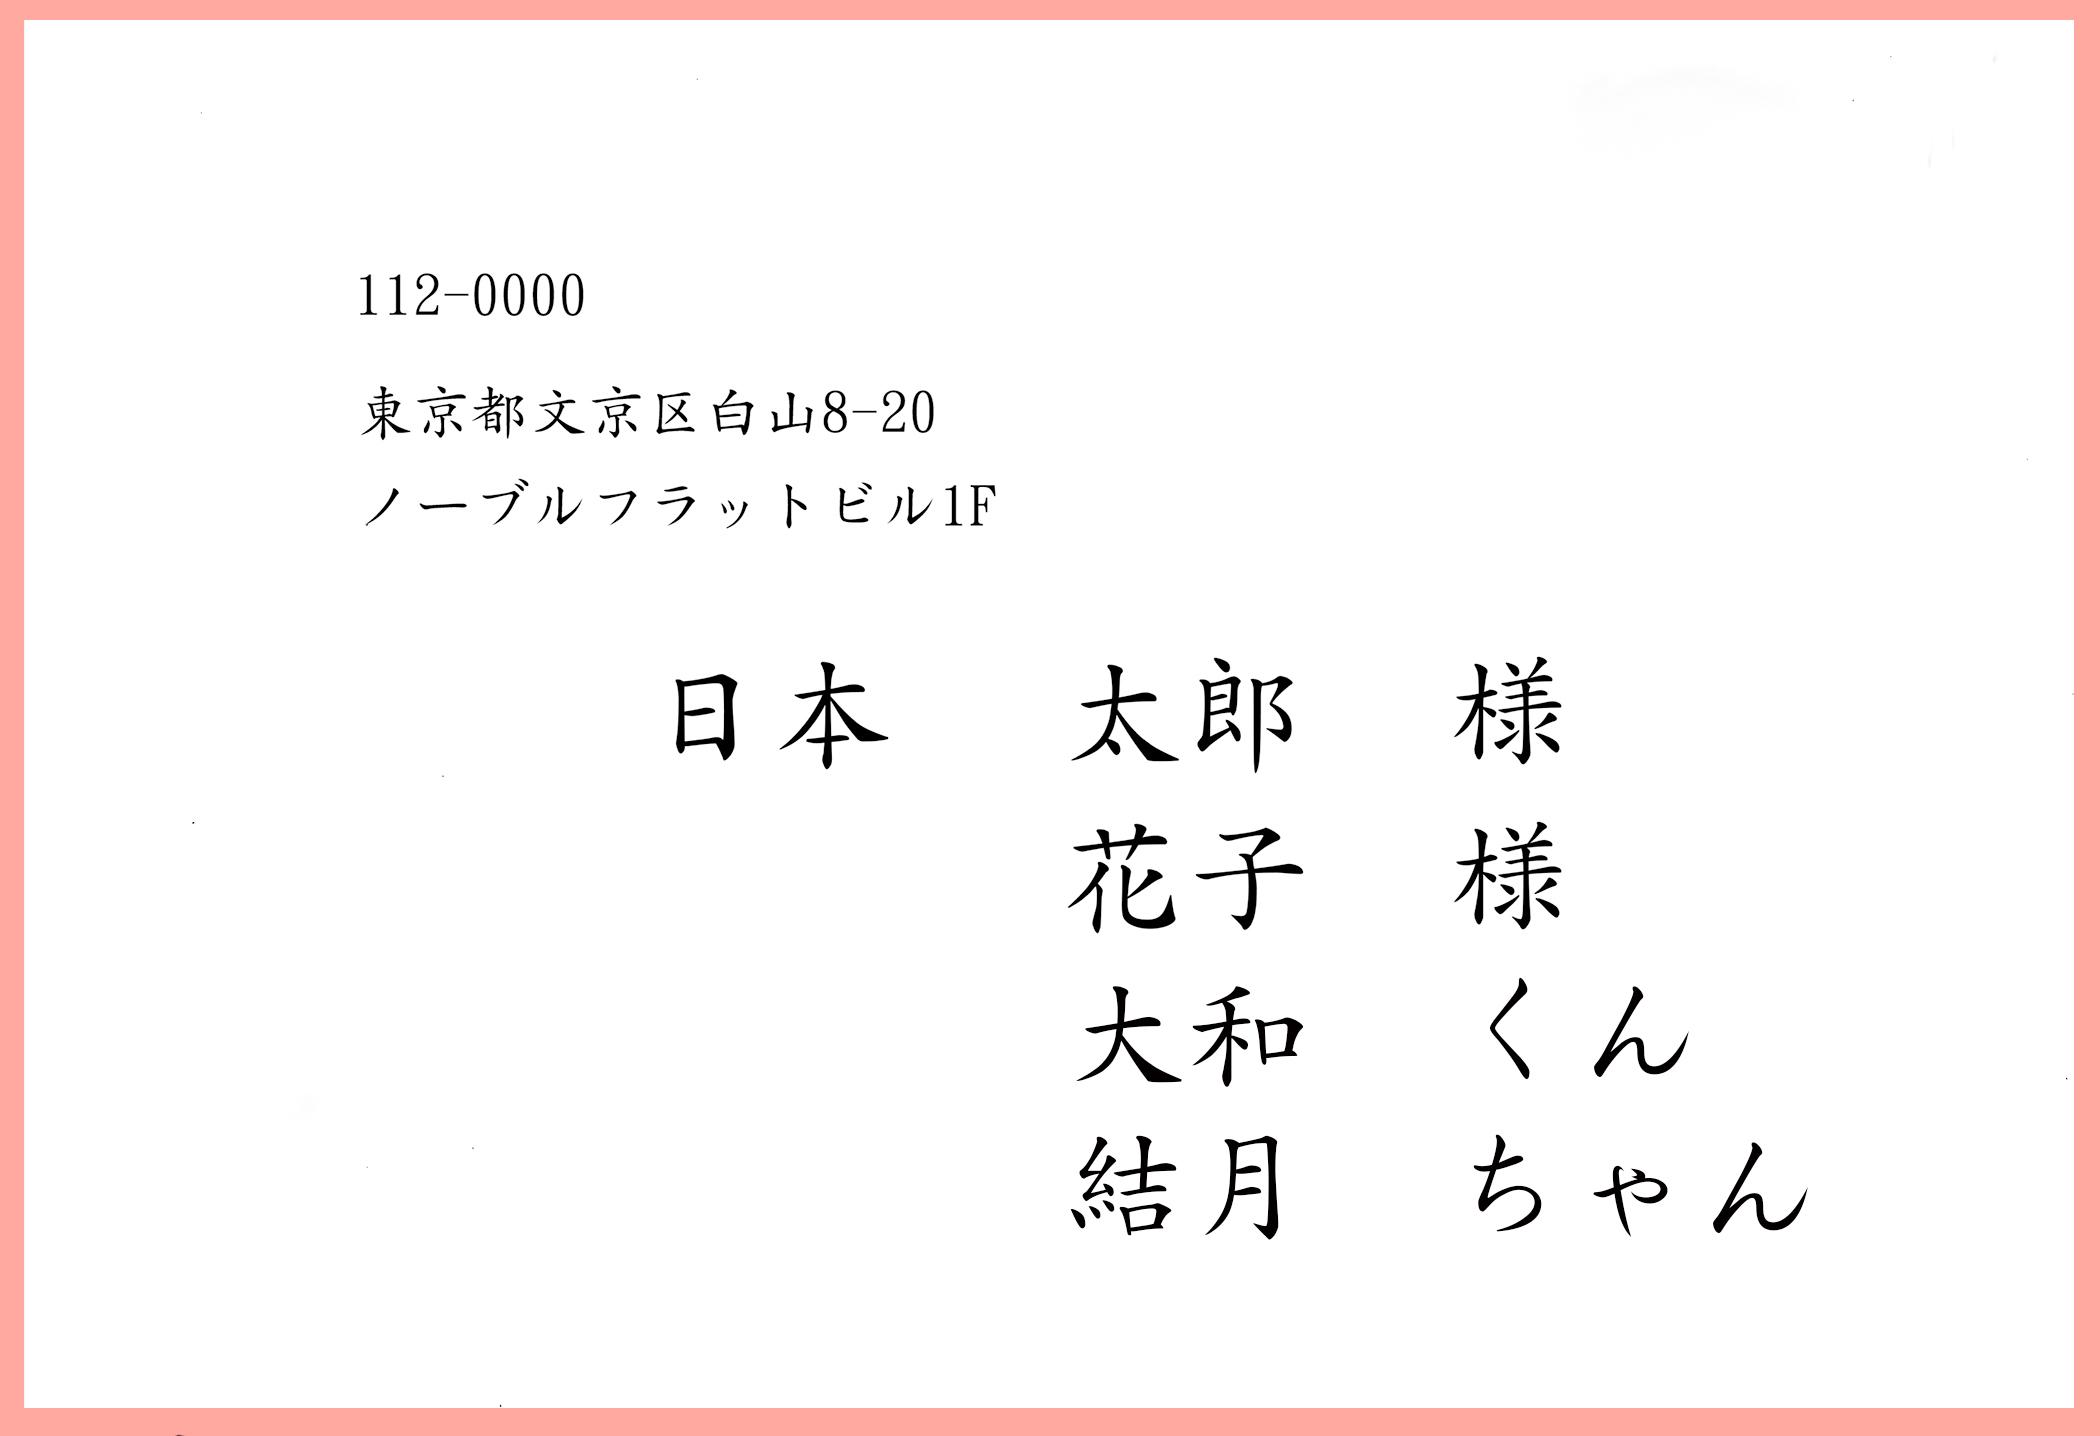 結婚式・招待状・宛名印刷無料印字サンプル紹介6